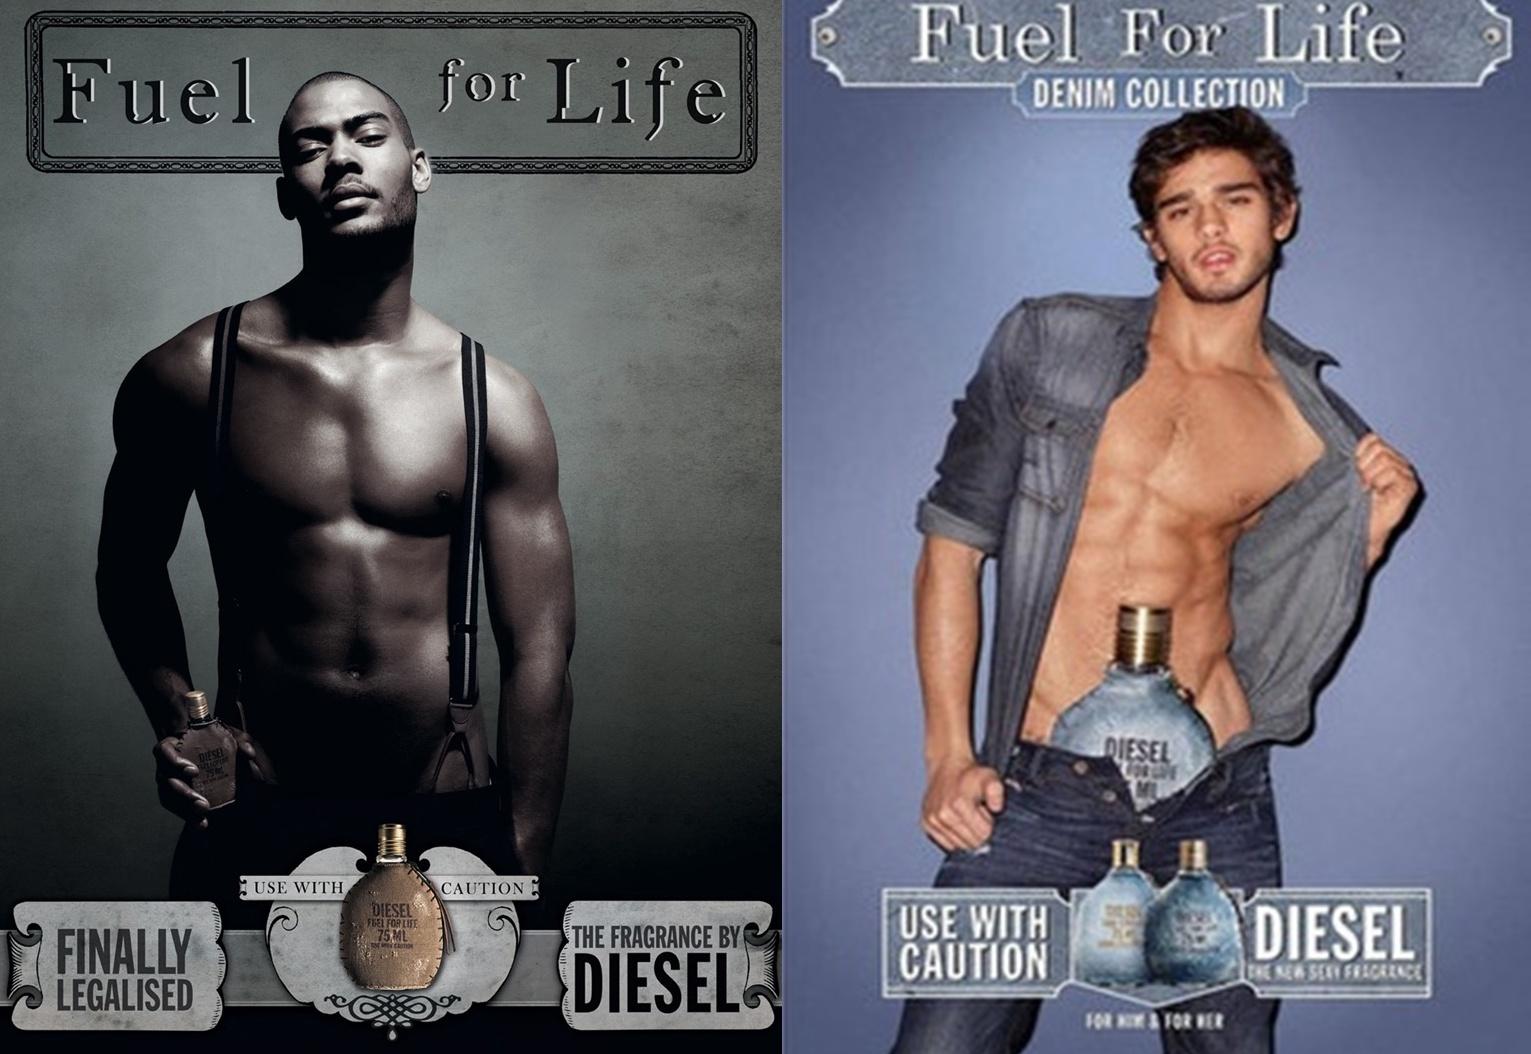 http://4.bp.blogspot.com/-Z3sxbY54yCo/TtlNpVNLjcI/AAAAAAAADJc/NX0mI7D2TFQ/s1600/Diesel.jpg